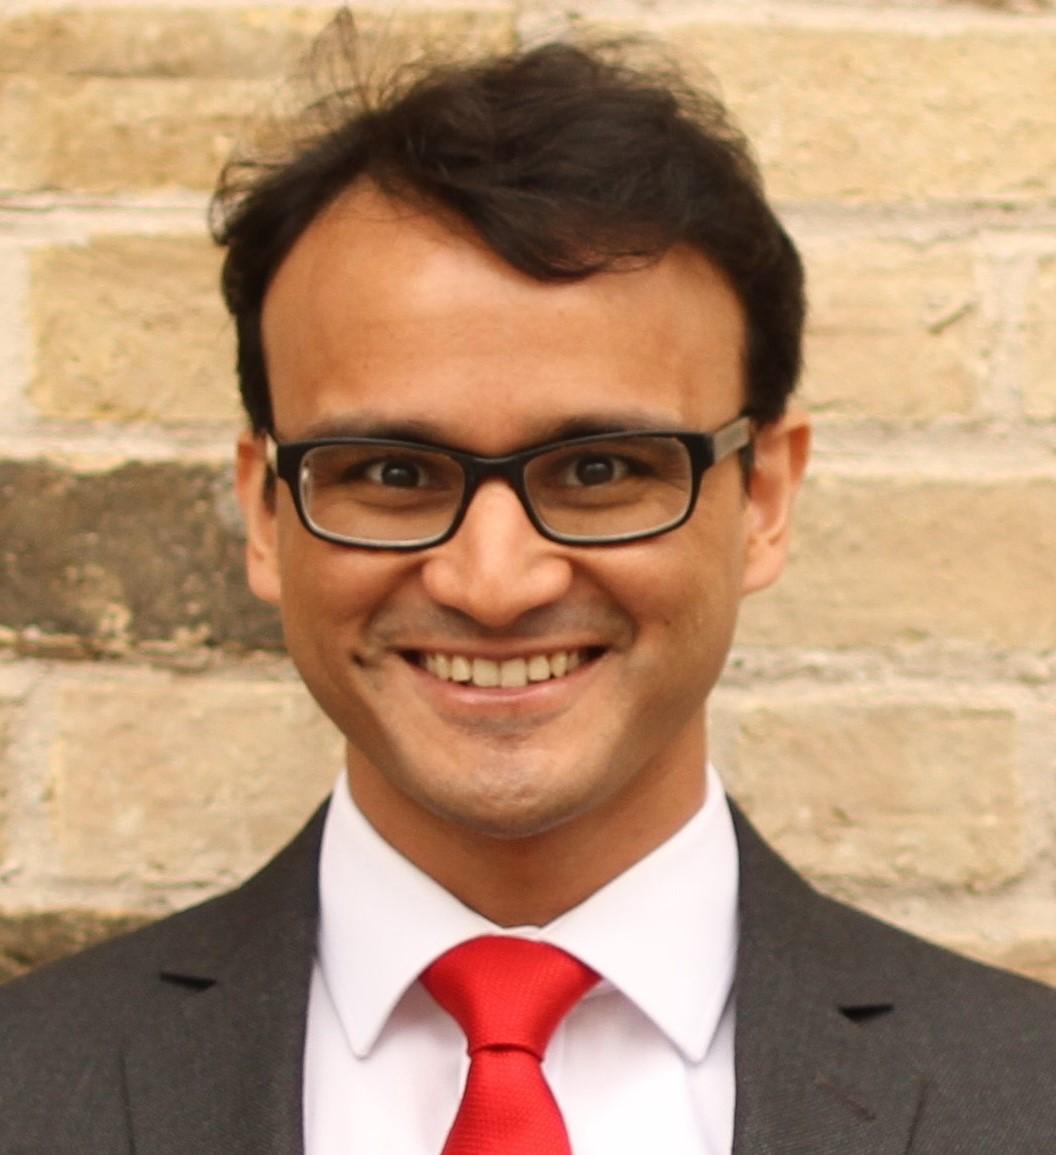 Arjun S - International Relations Tutor